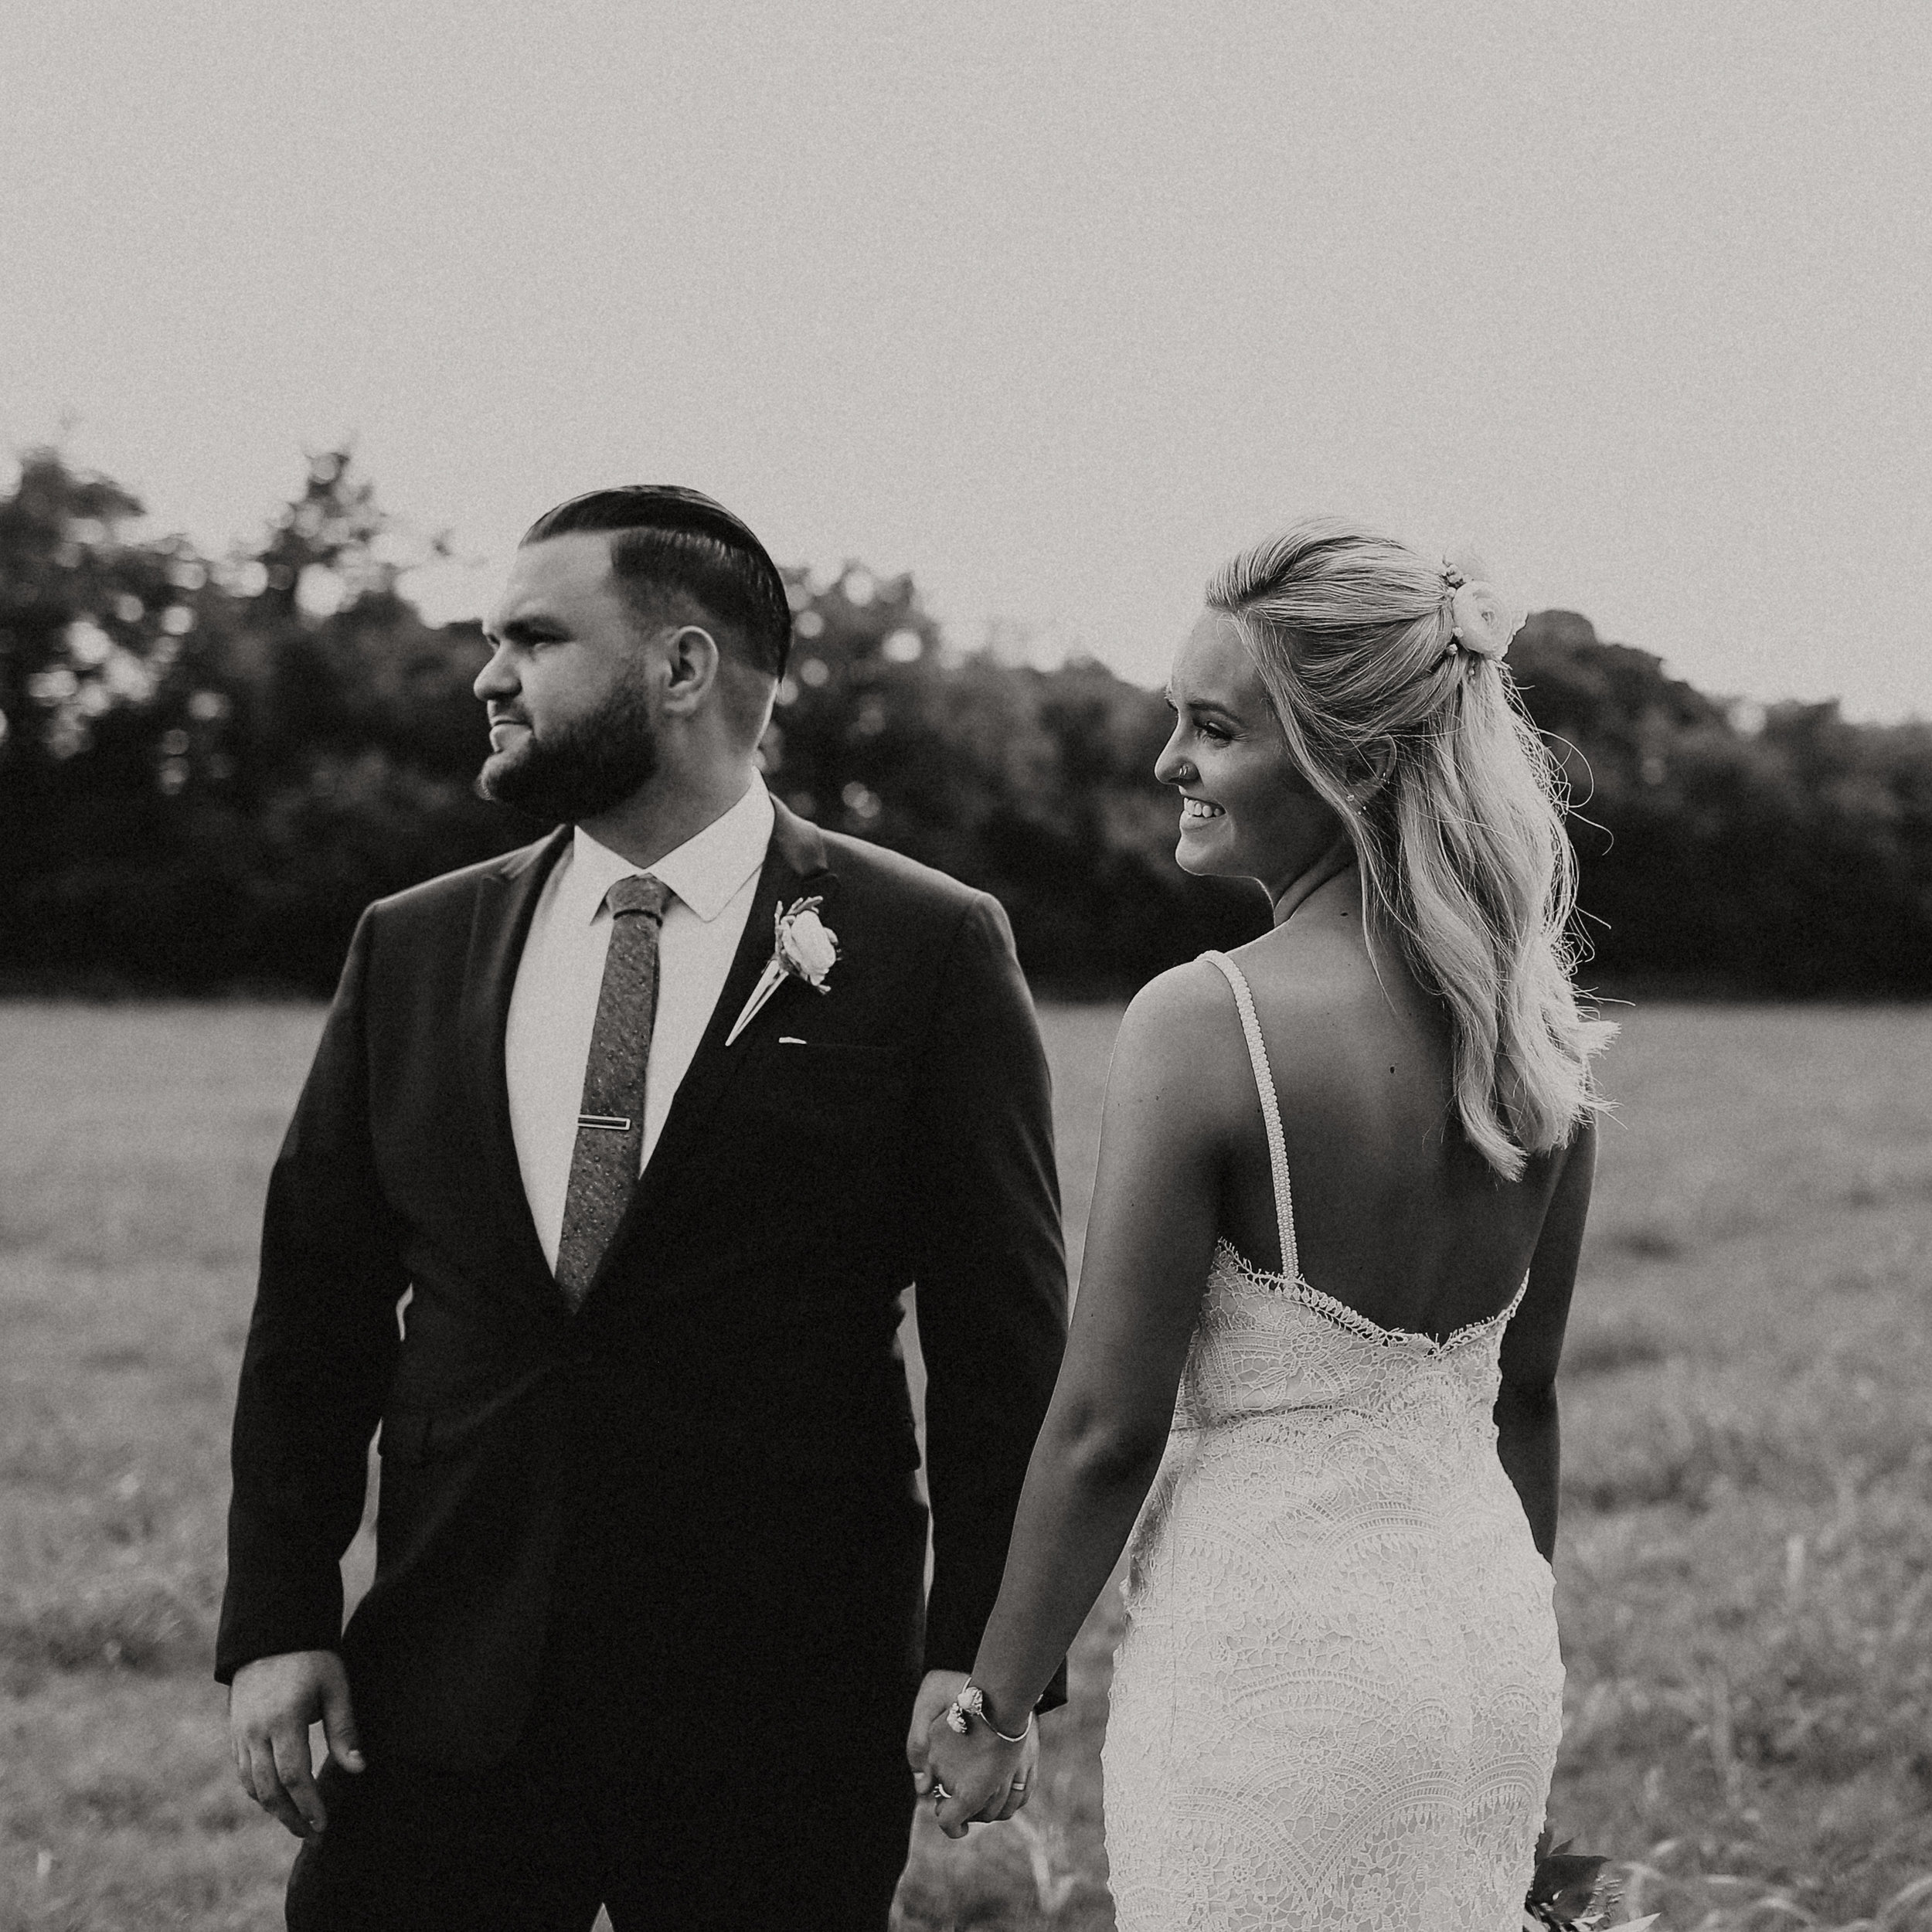 Backyard_Wedding_Oklahoma_MelissaMarshall_15.jpg